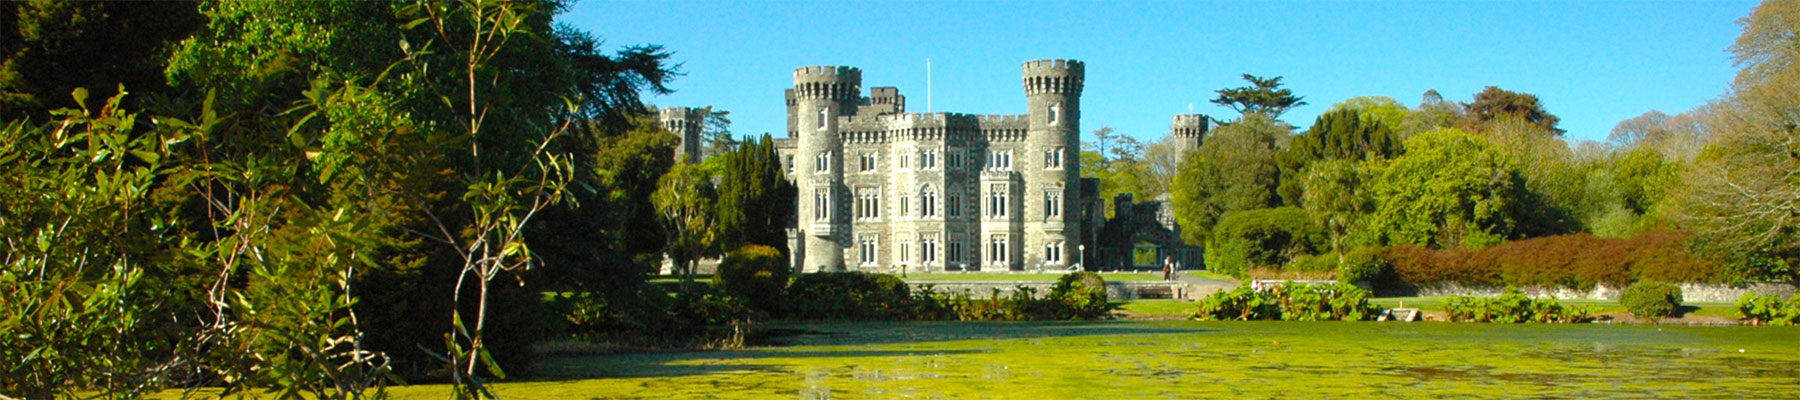 Johnstown Castle Large